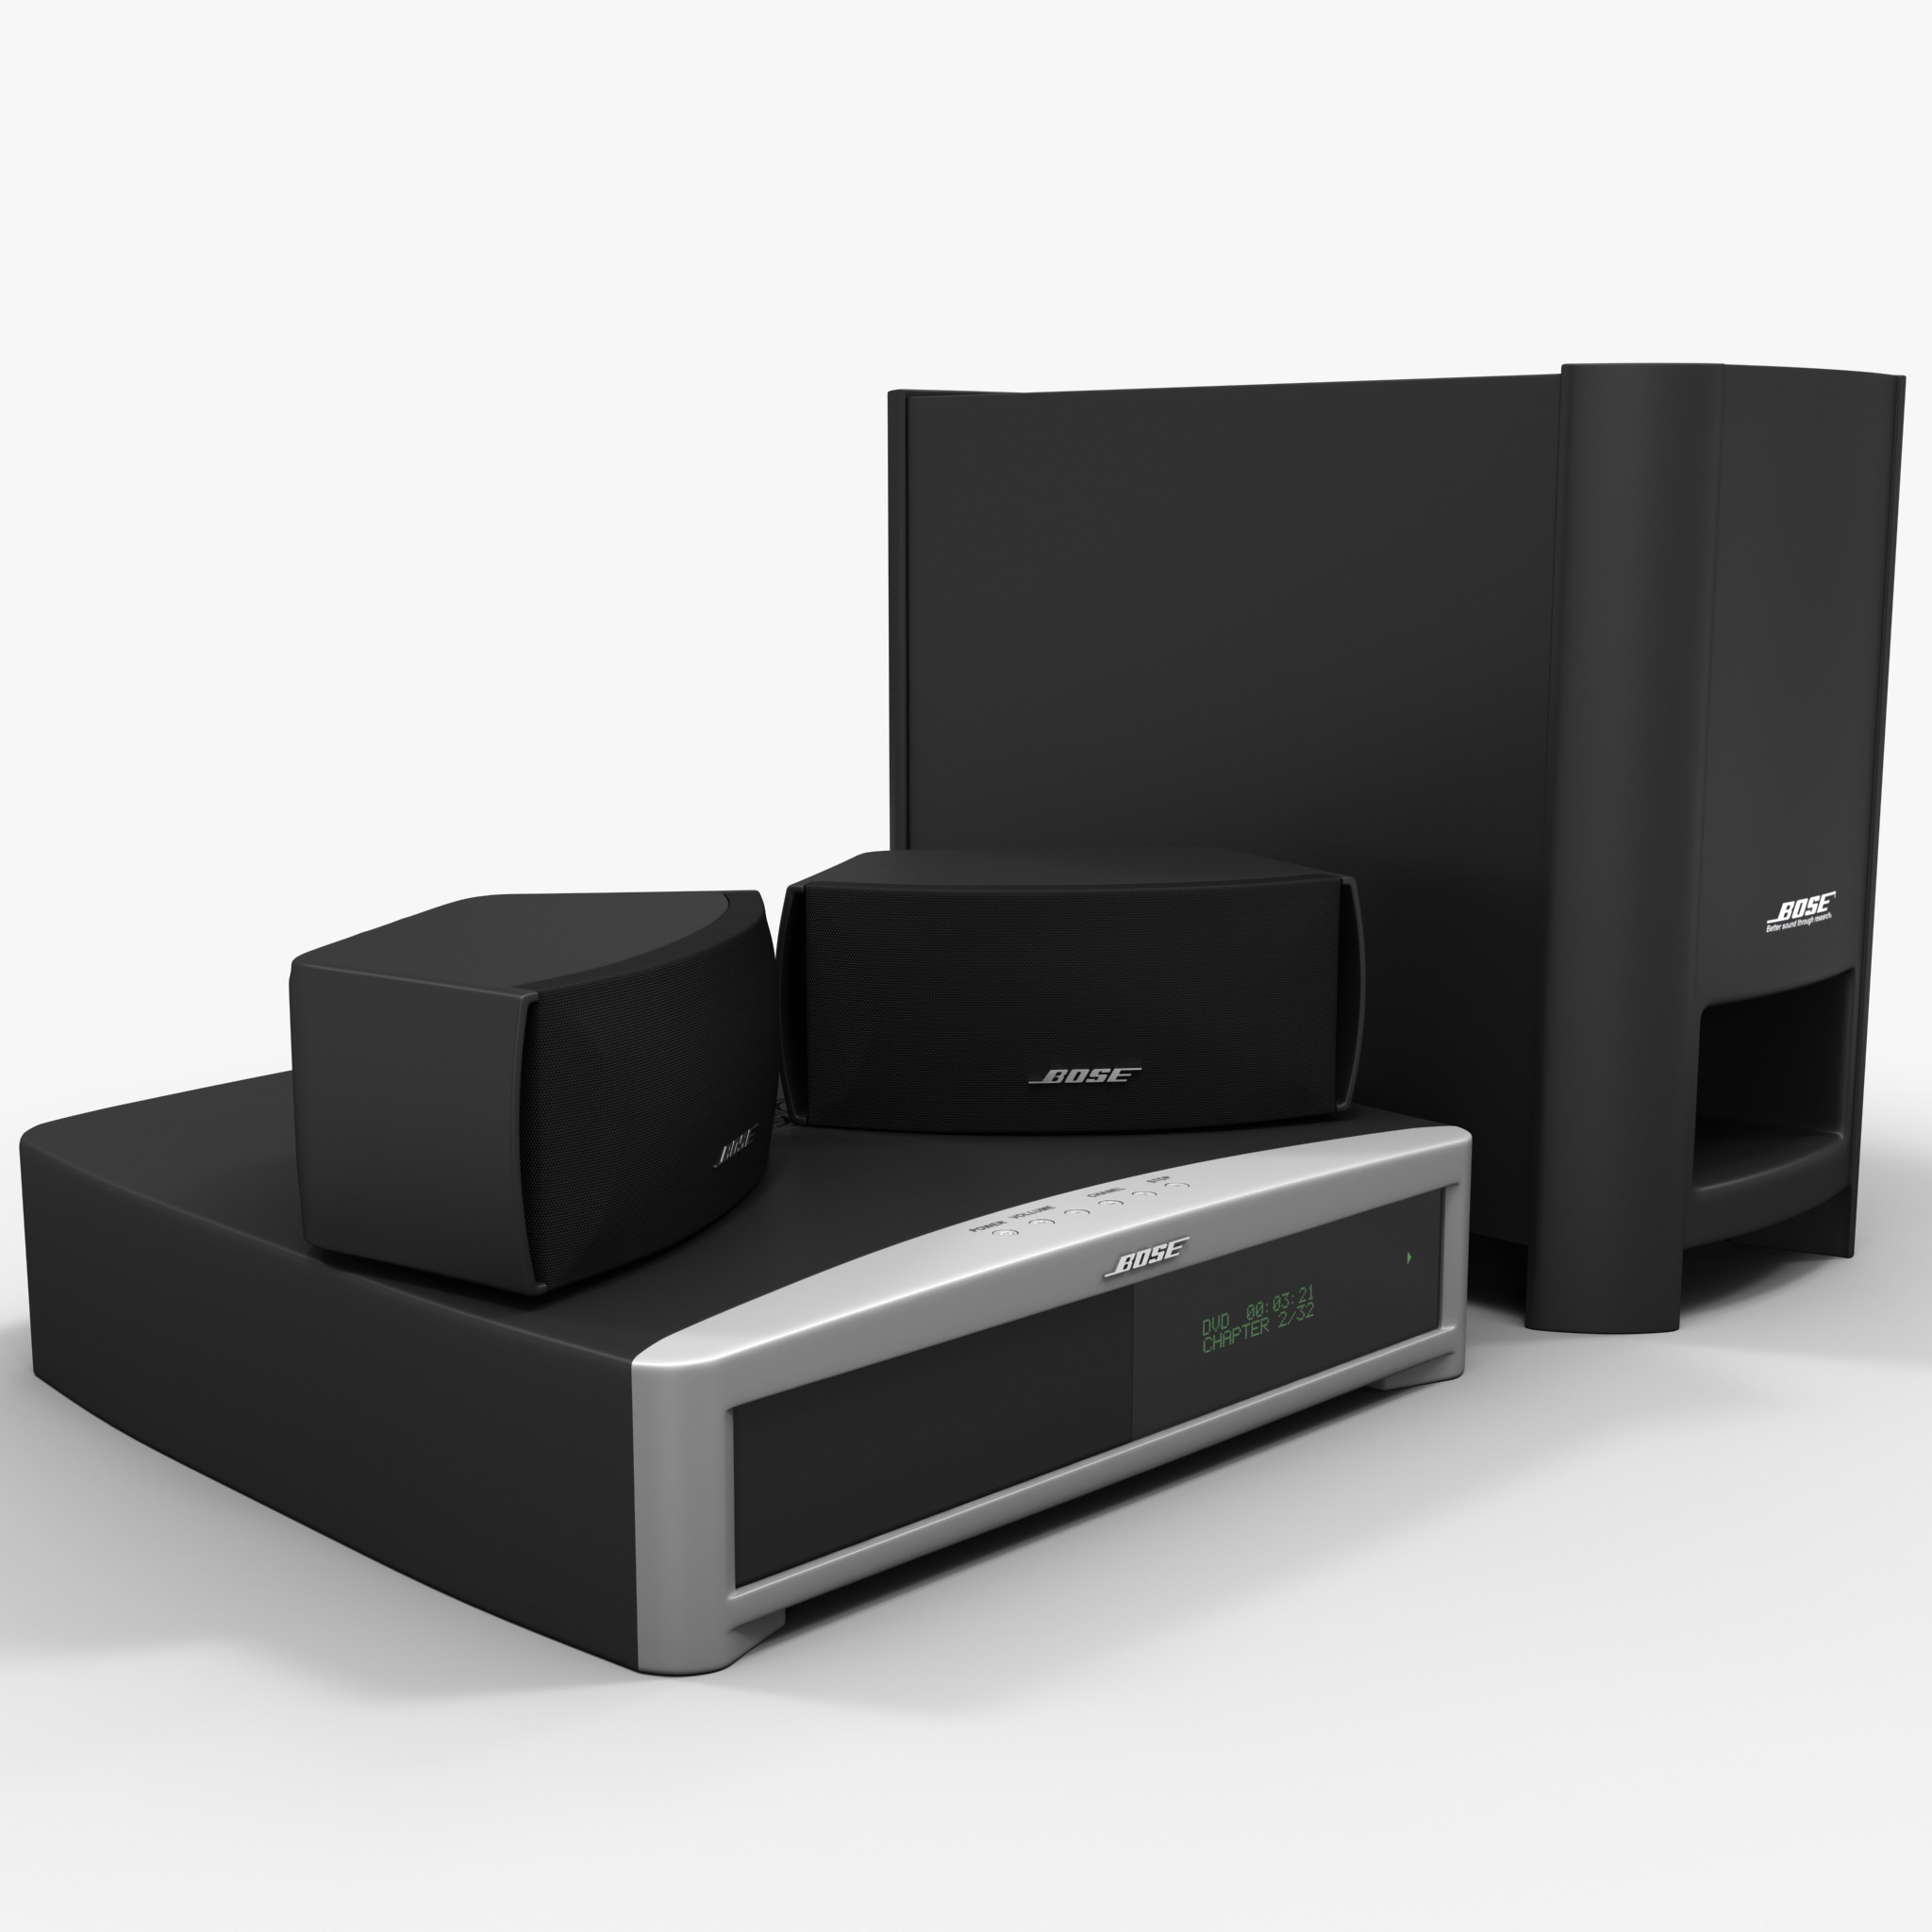 DVD Home Entertainment System Bose Graphite_2.jpg